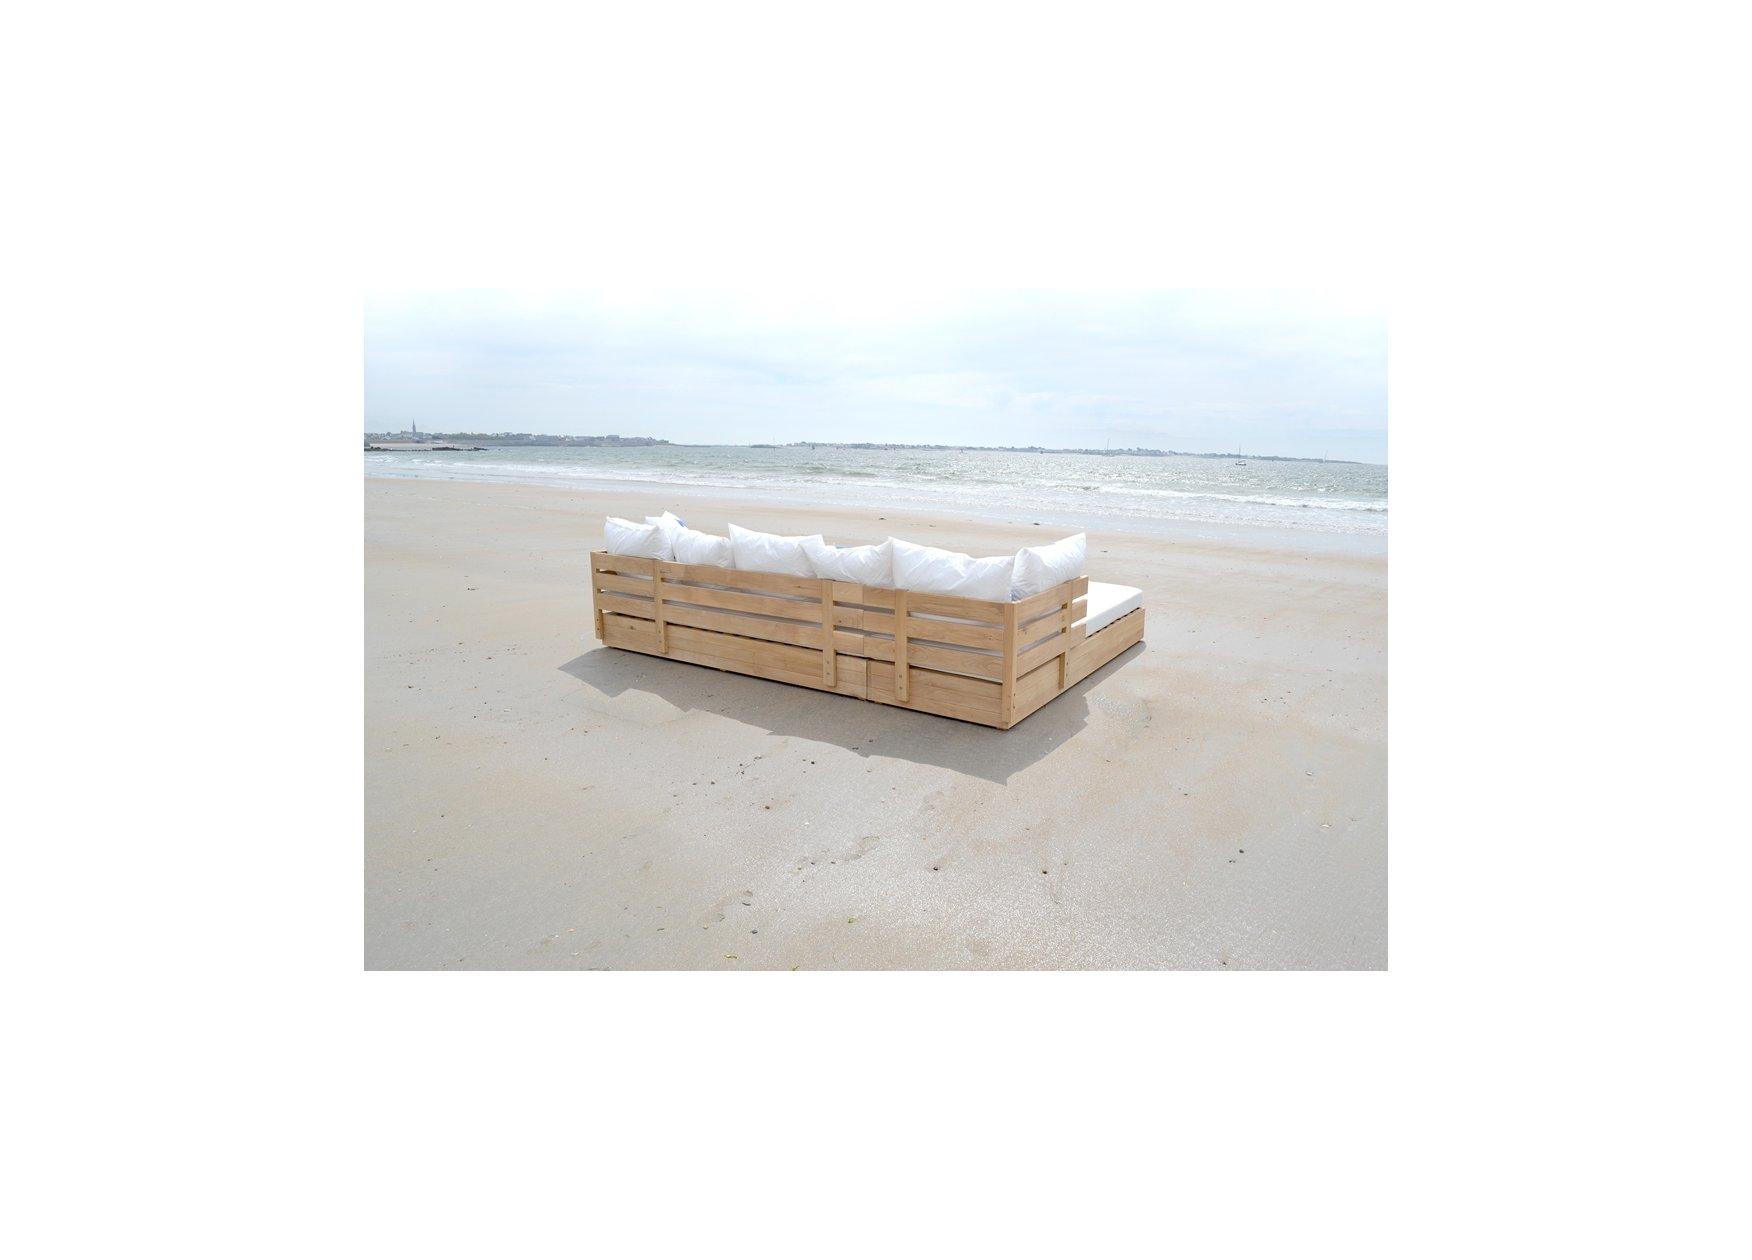 Turrini le canap design en voile de bateau recycl e by for Canape 727 sailbags